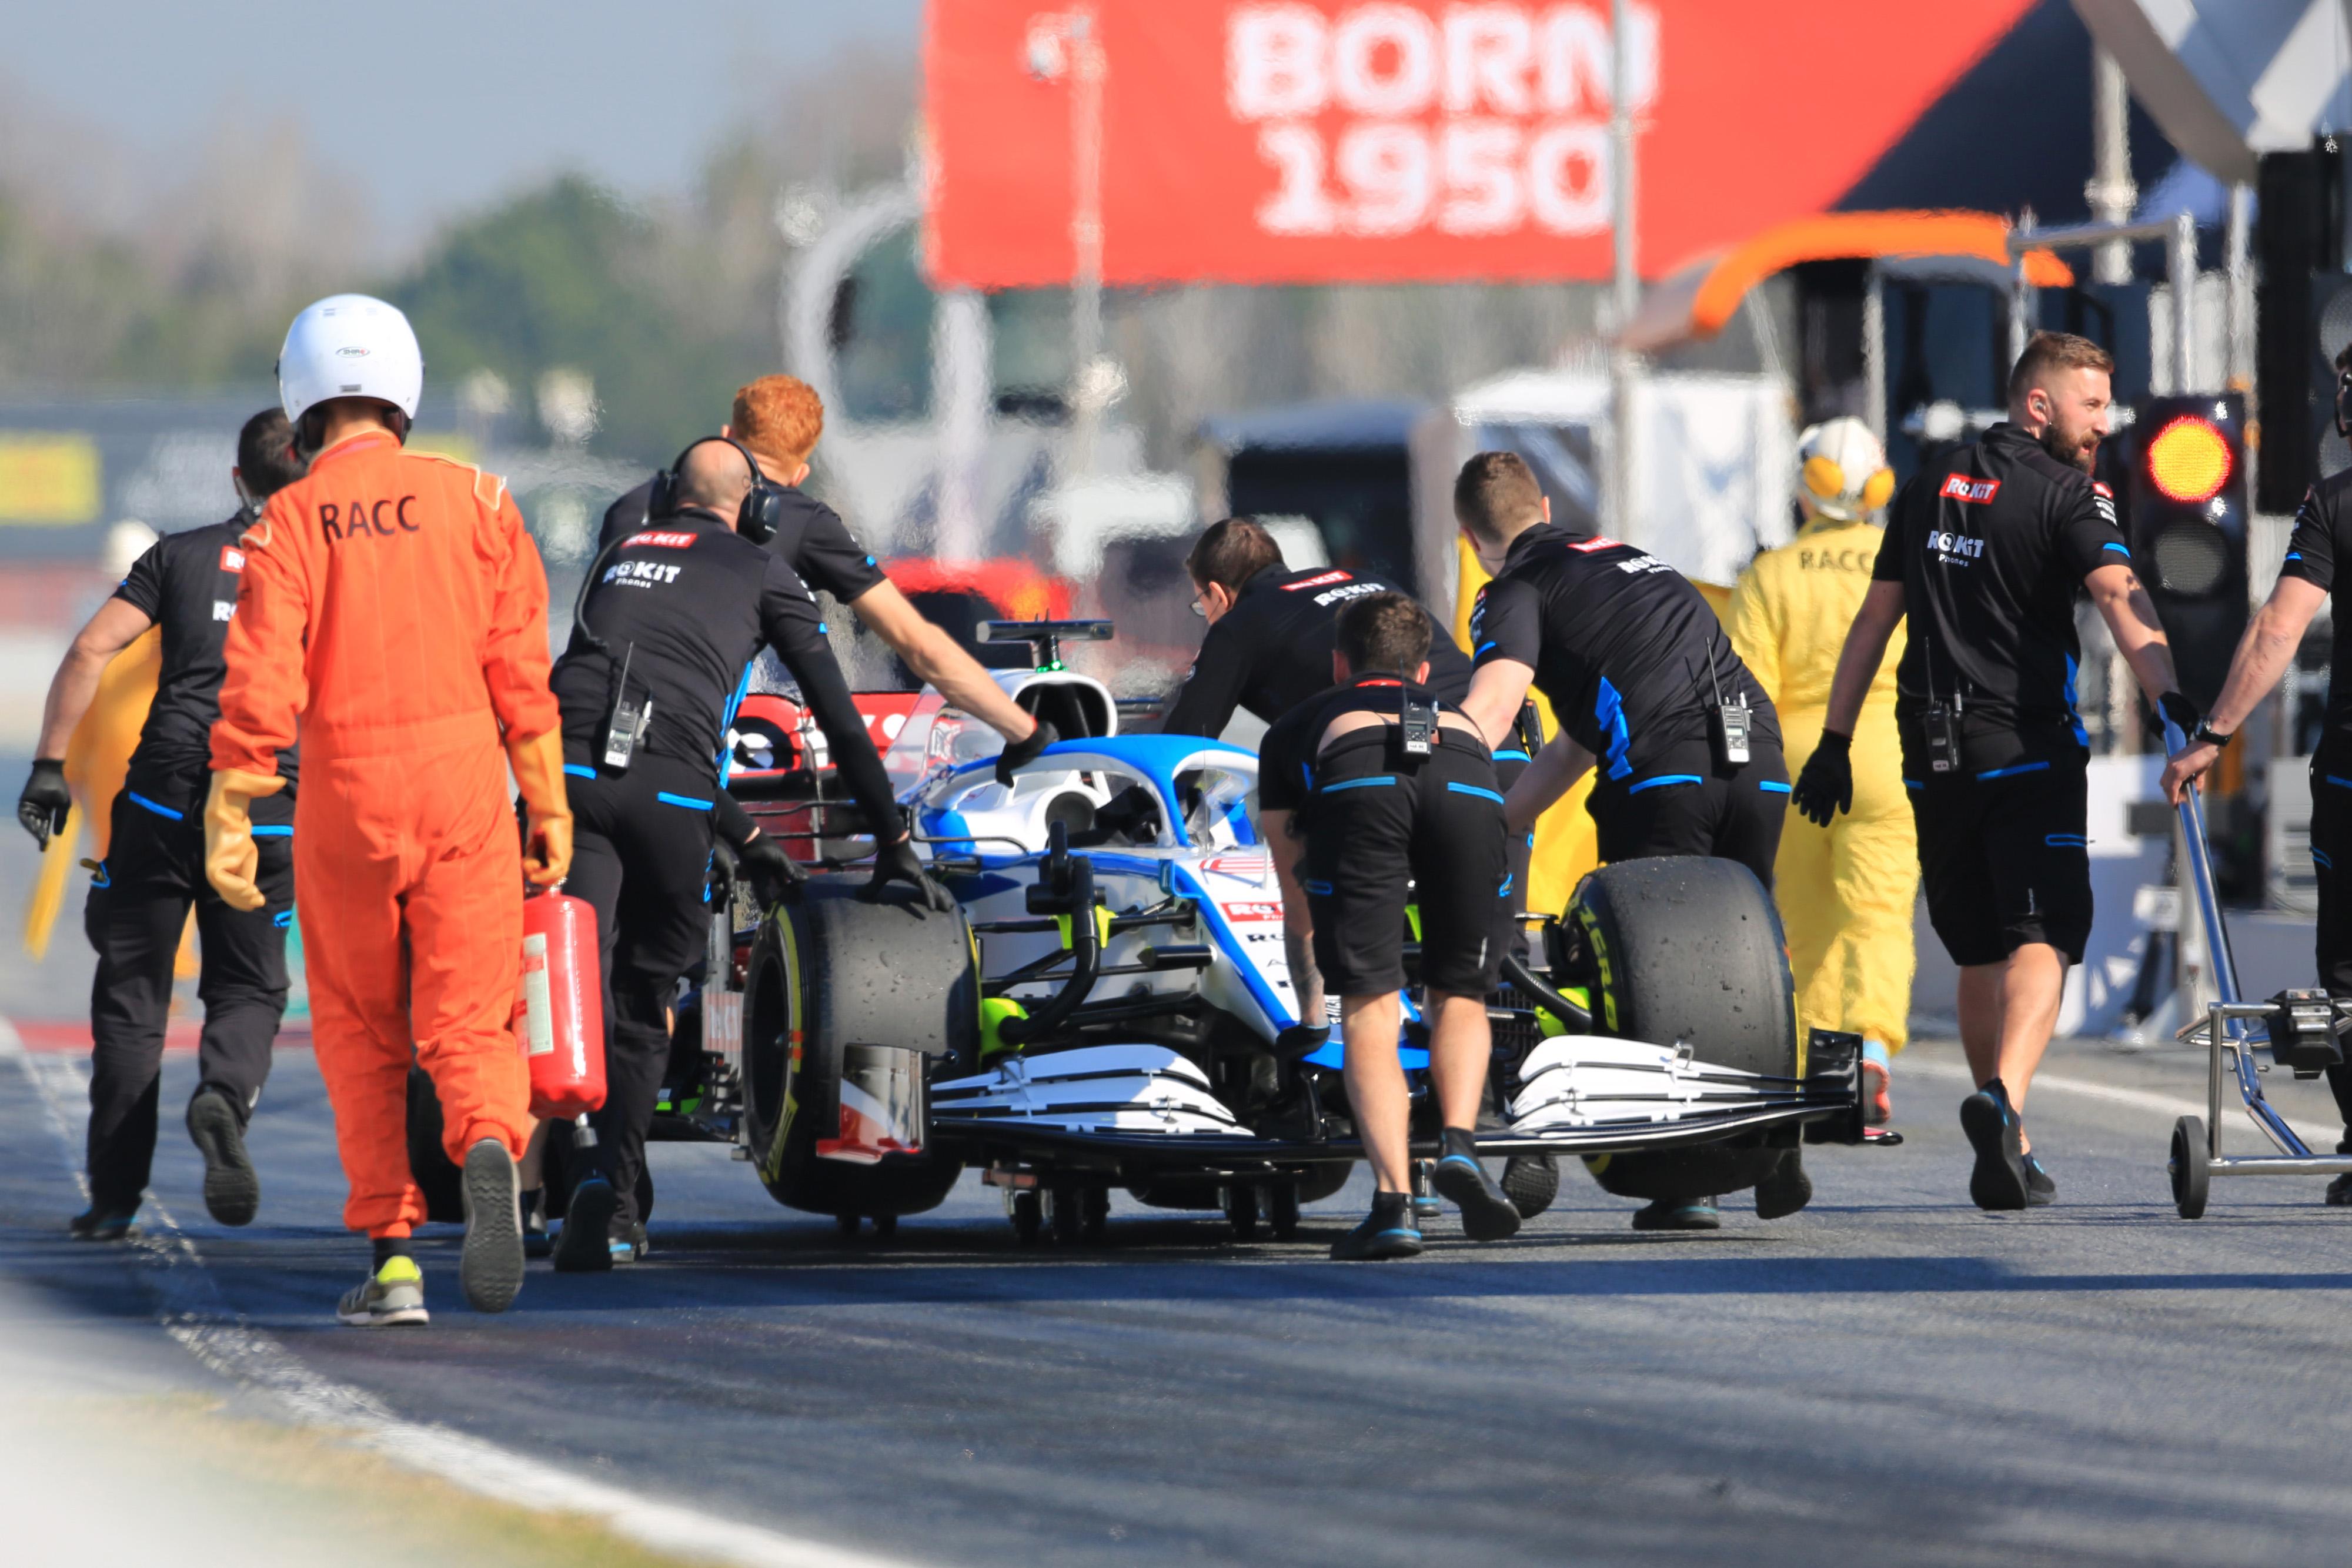 F1 Formula 1 testing Williams Nicholas Latifi